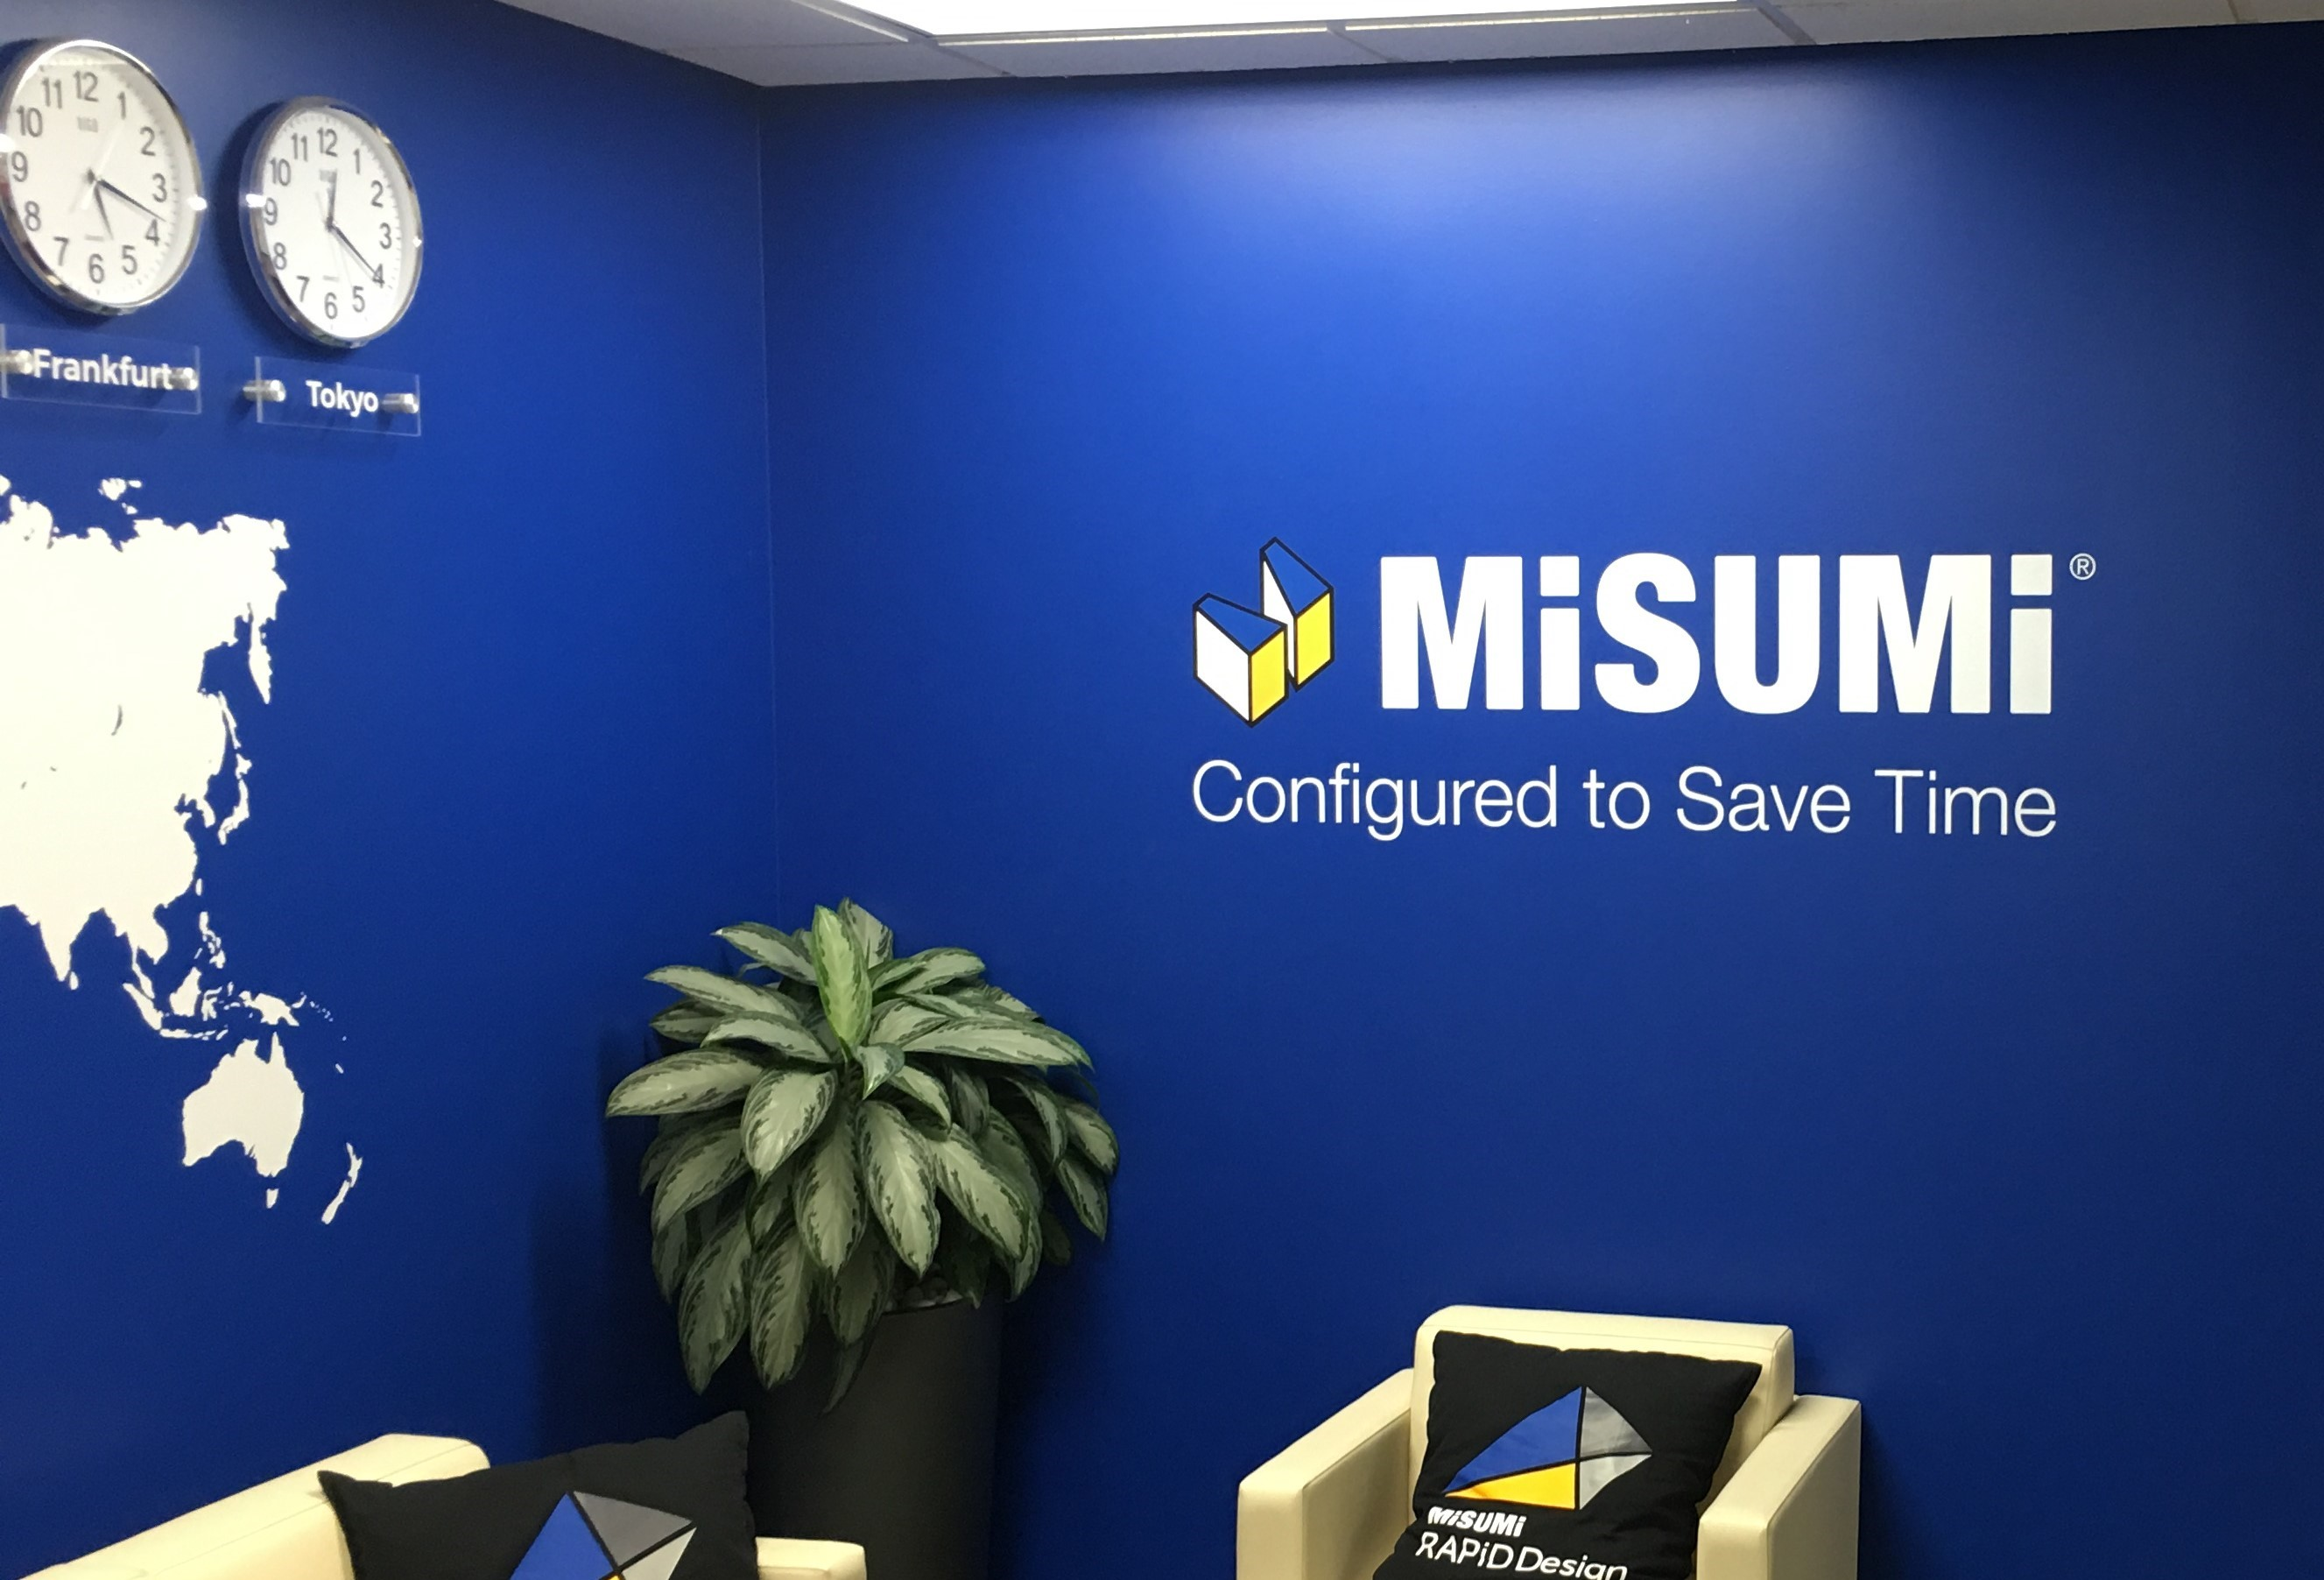 MiSUMi Wall Sign